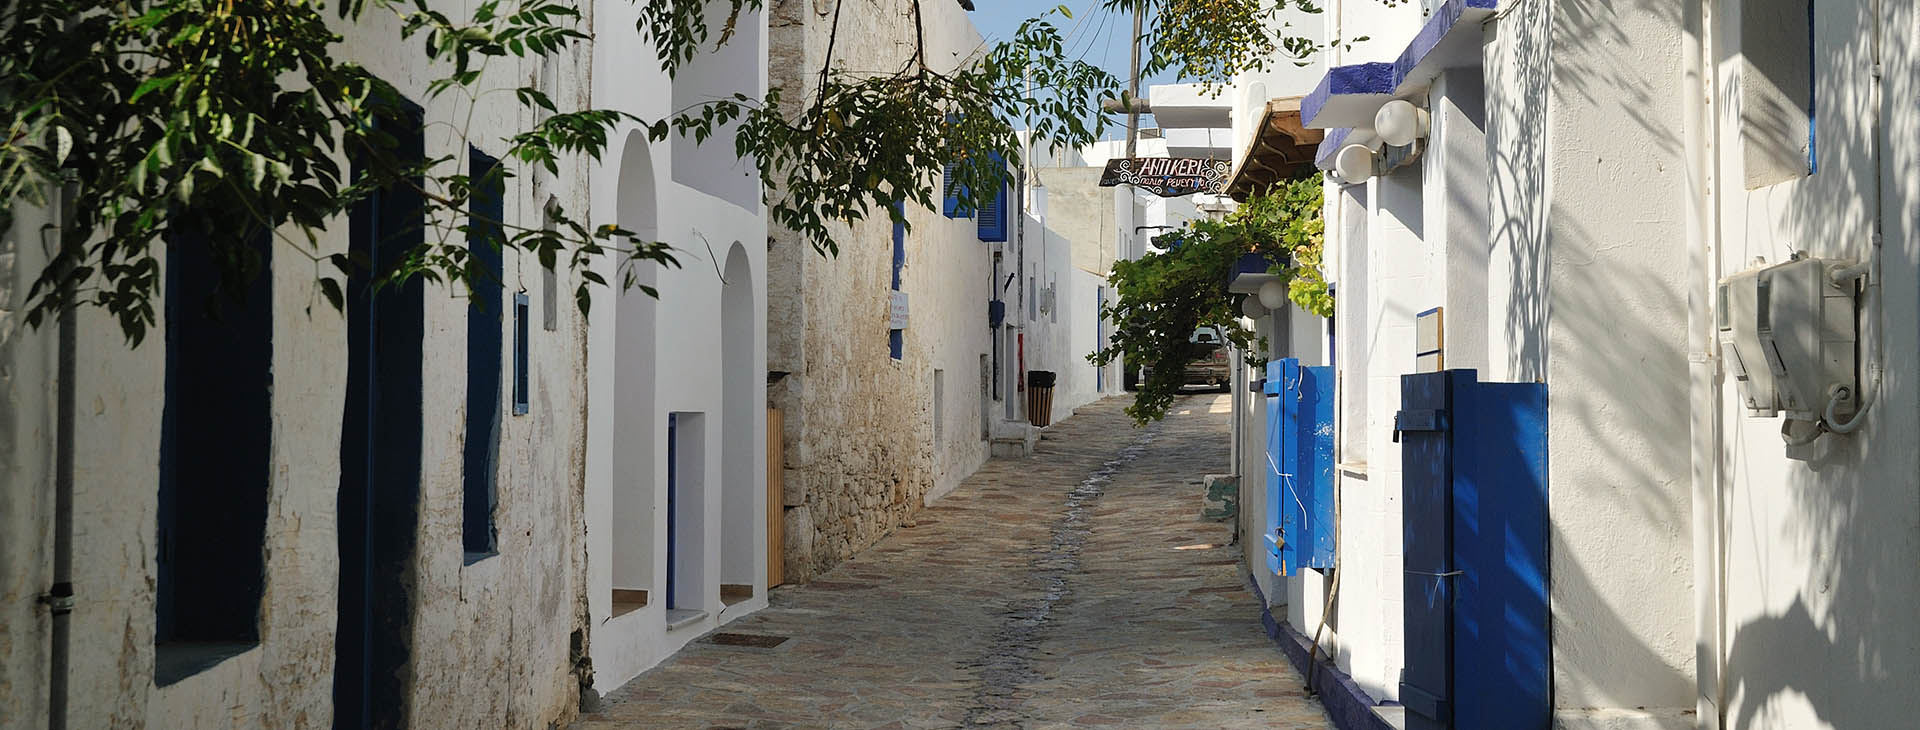 Chora, Koufonissi island